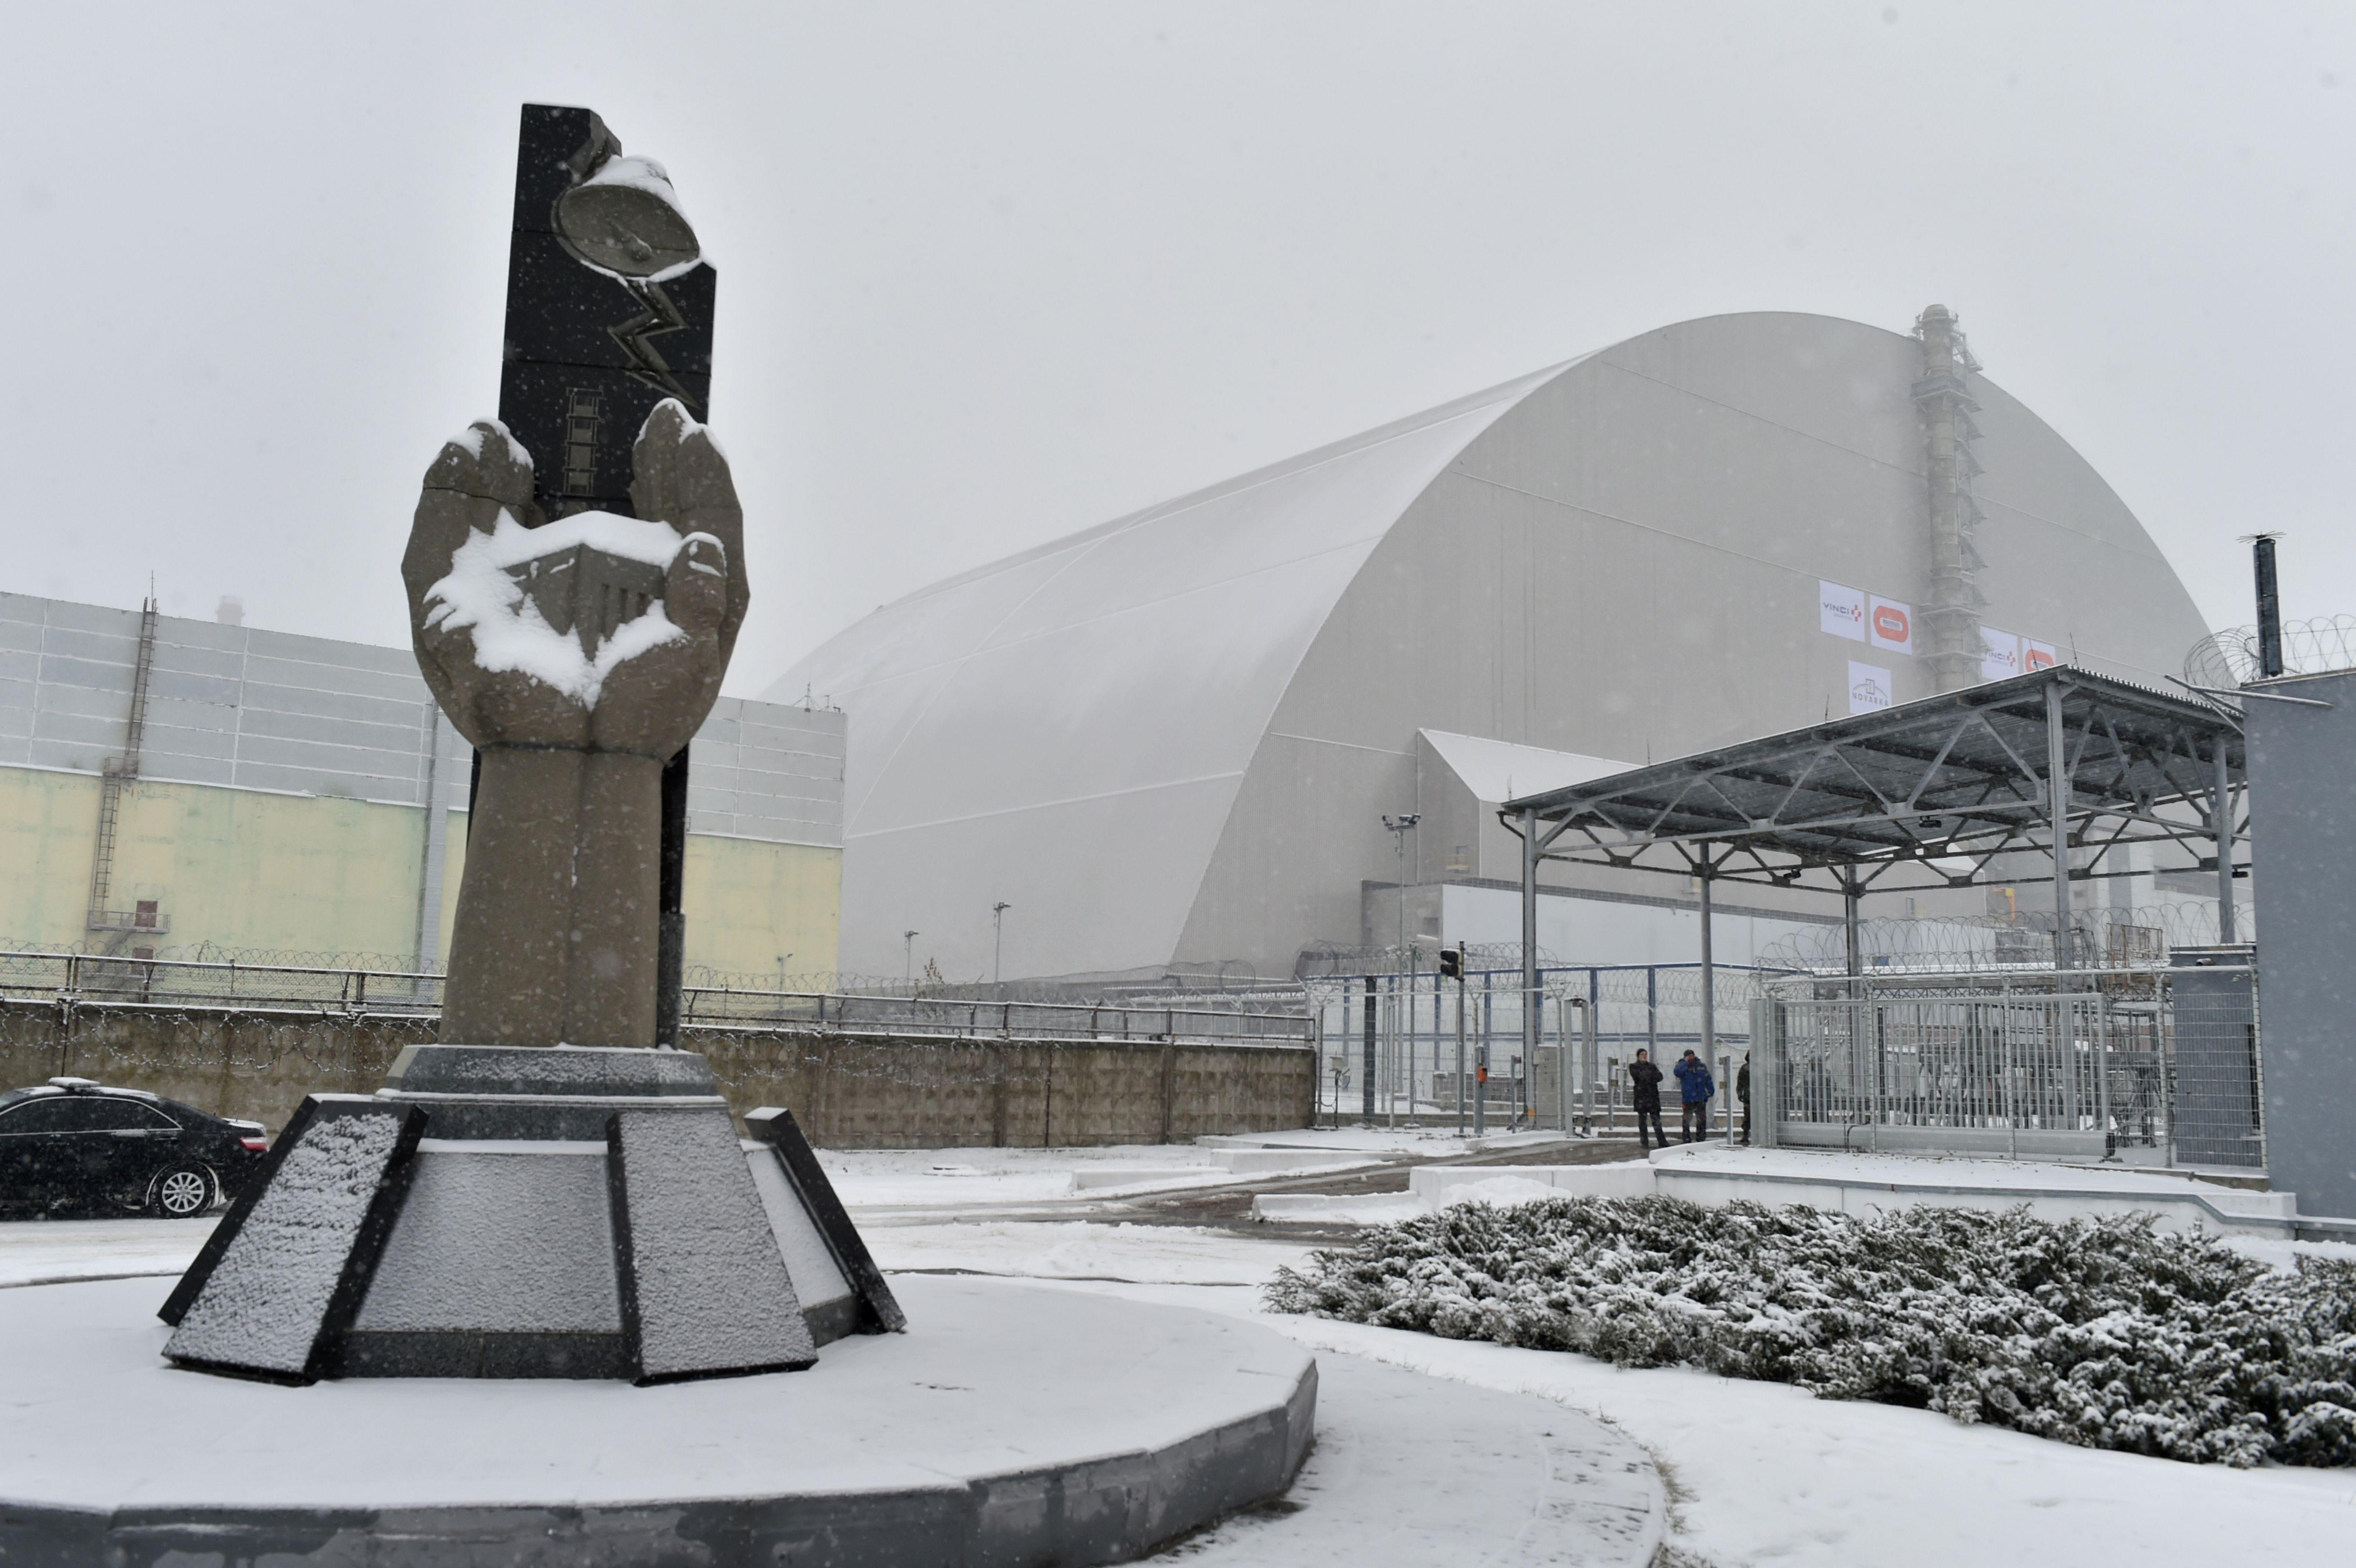 Gigantic lid on Chernobyl mess | The Standard